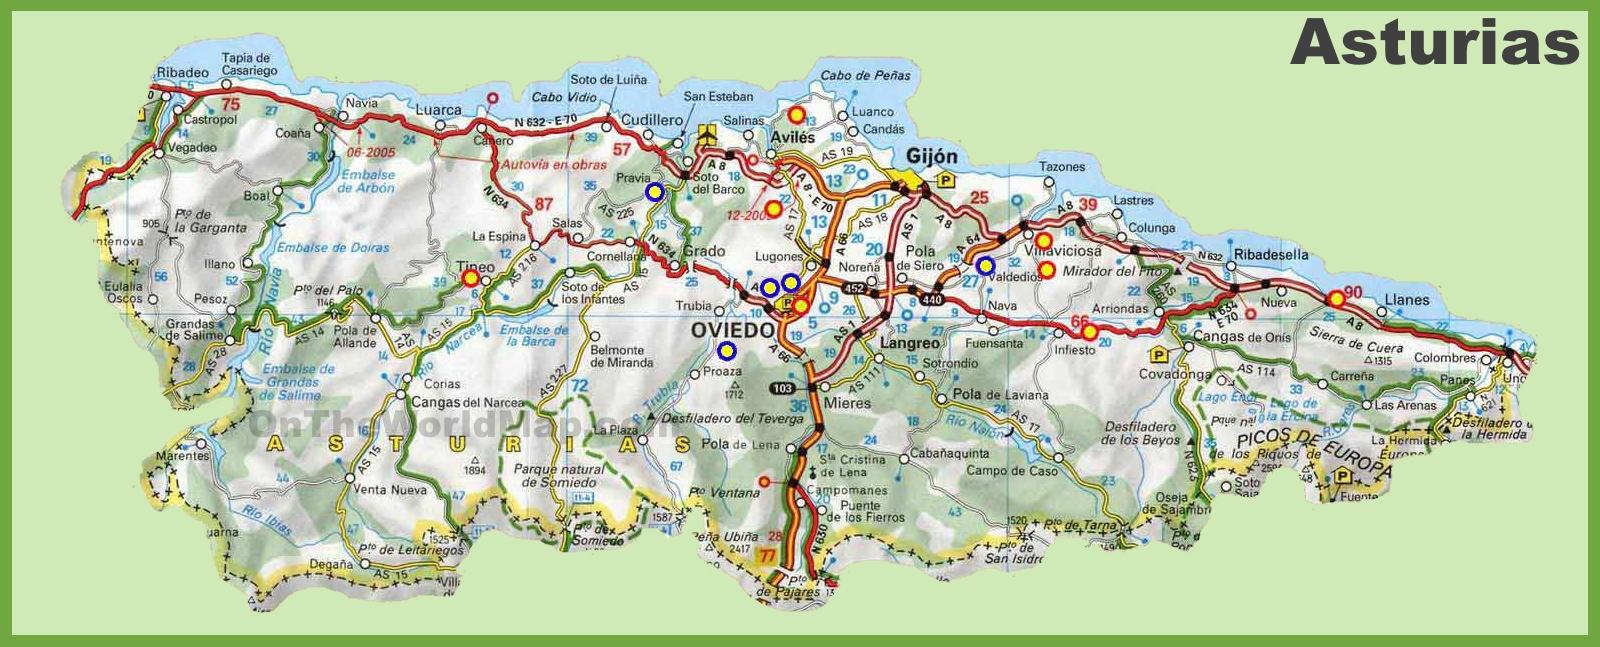 Asturias road map